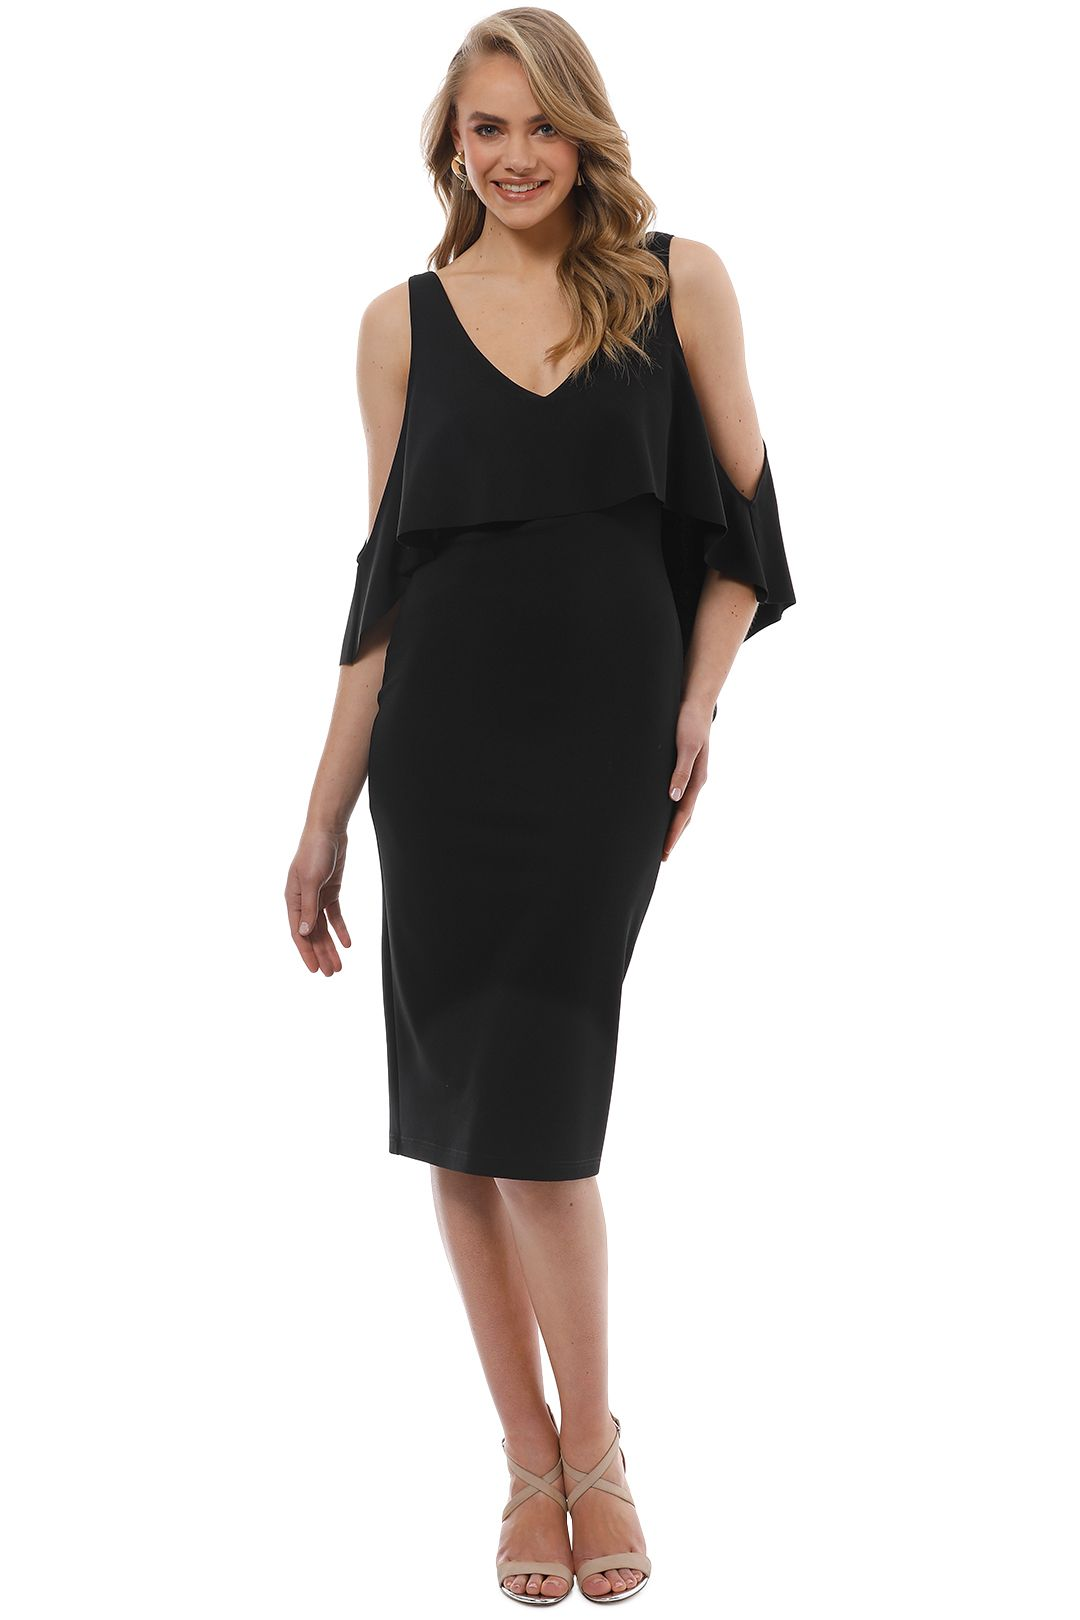 Pasduchas - Stella Midi Dress - Black - Front